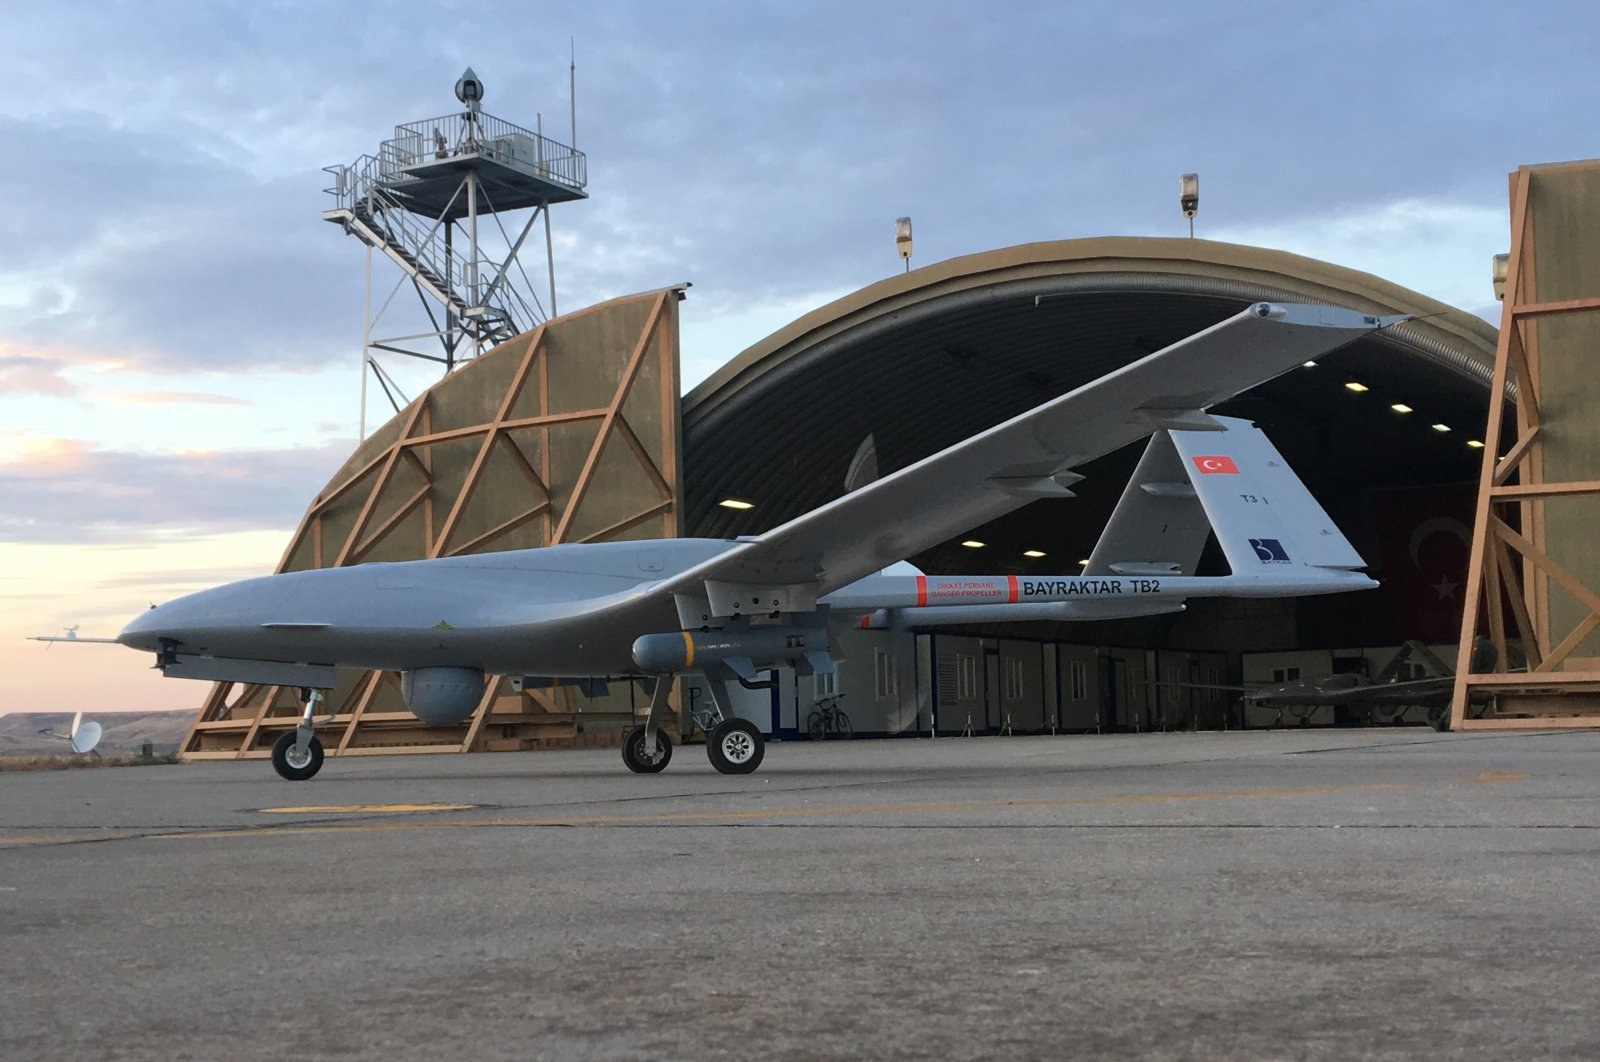 A view of a Bayraktar TB2 combat drone. (Baykar Makina via AA)